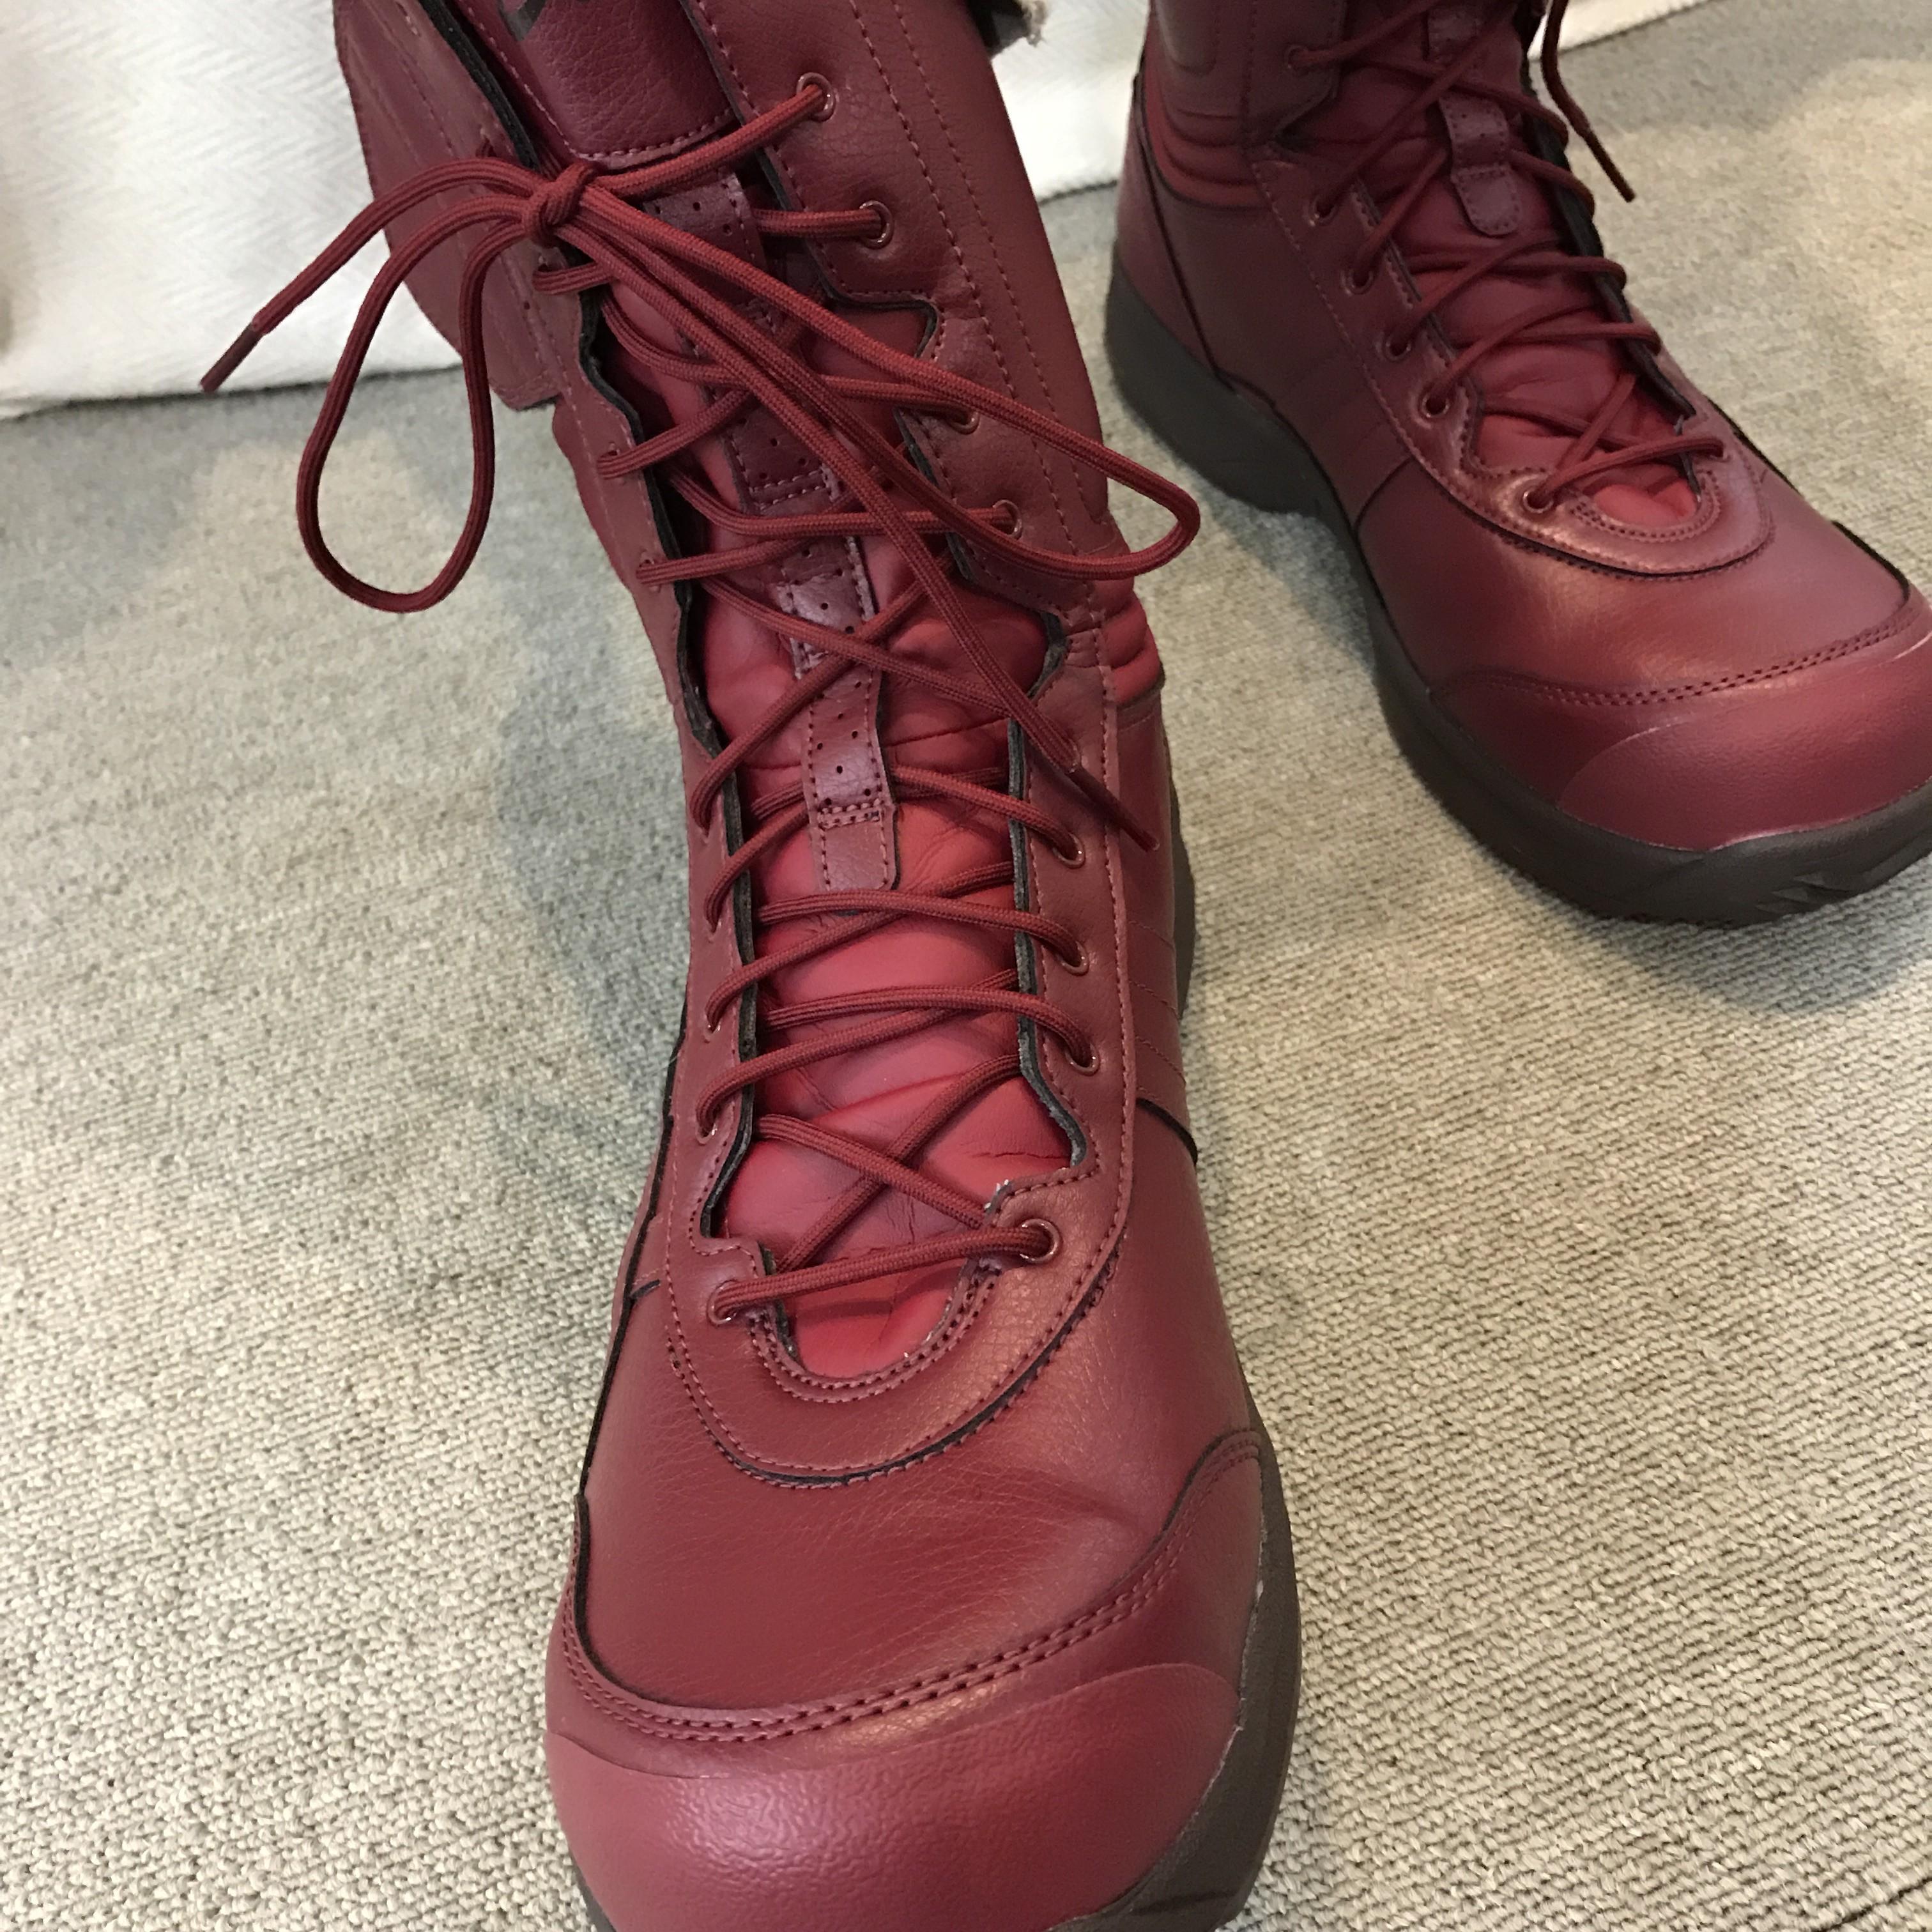 asics|アシックス|安全靴| ウィンジョブ500 / FIS500 限定カラーザクロ×コーヒー